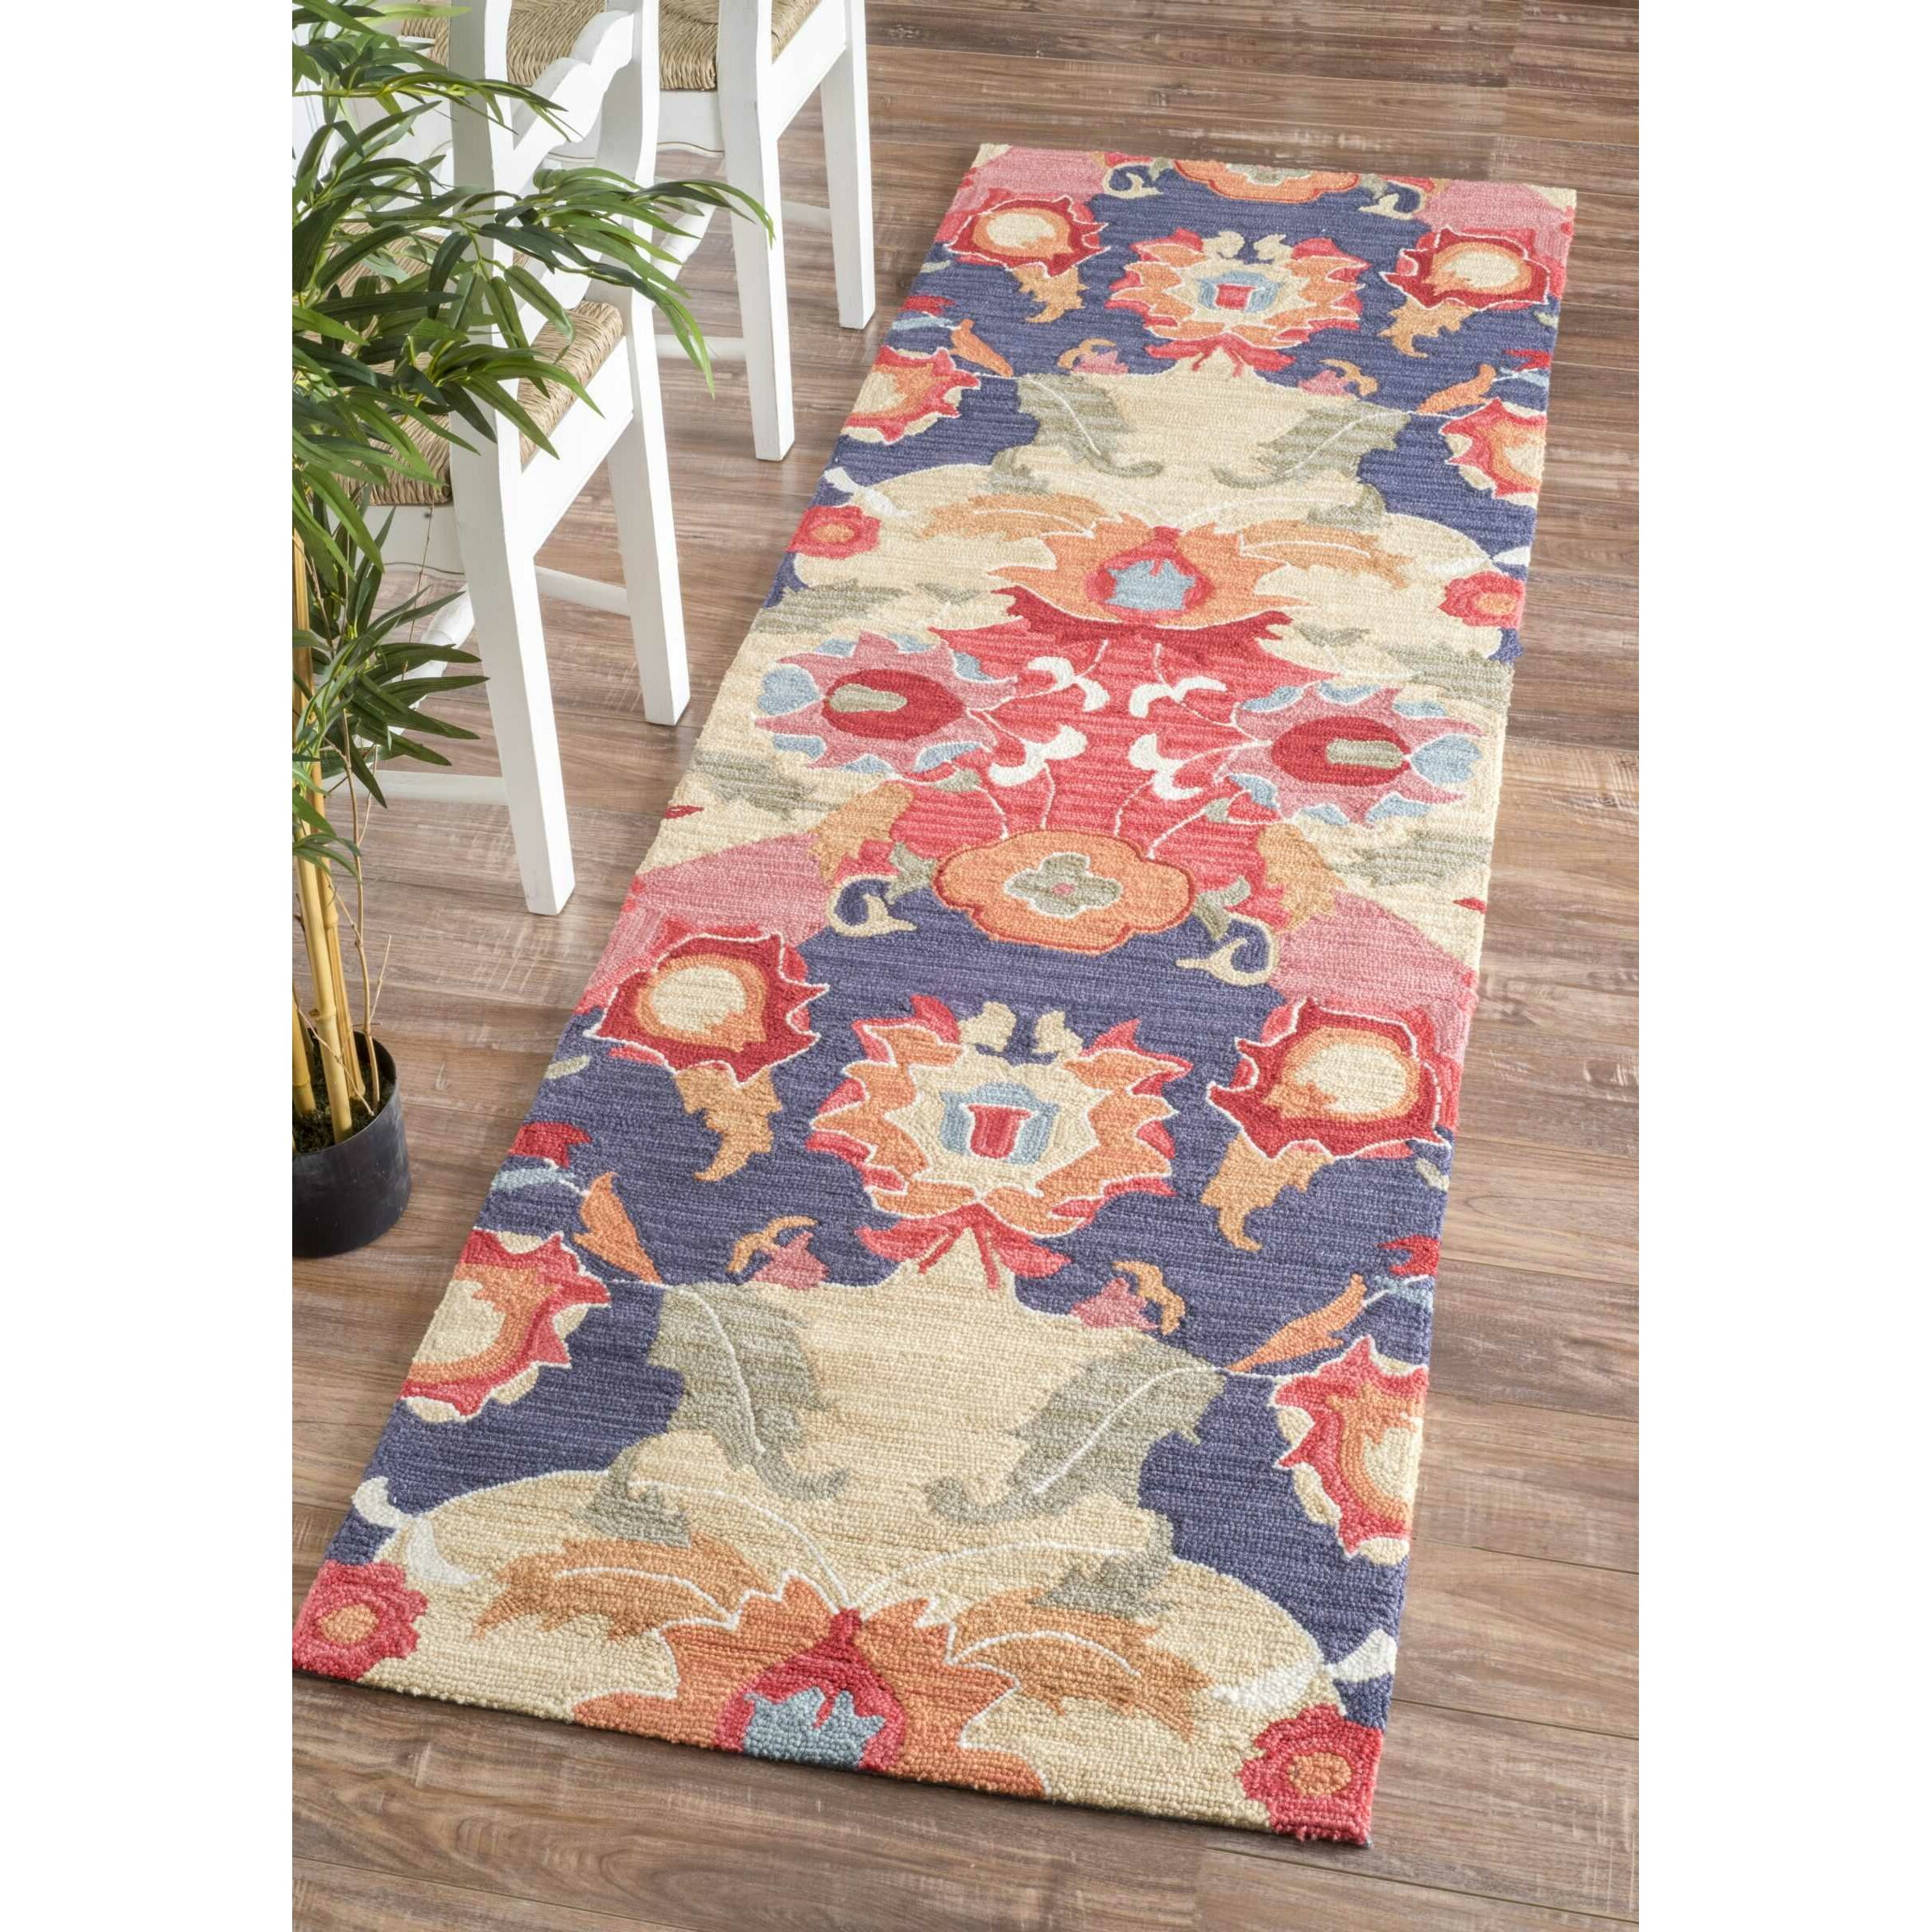 world menagerie maastricht red blue area rug reviews wayfair. Black Bedroom Furniture Sets. Home Design Ideas